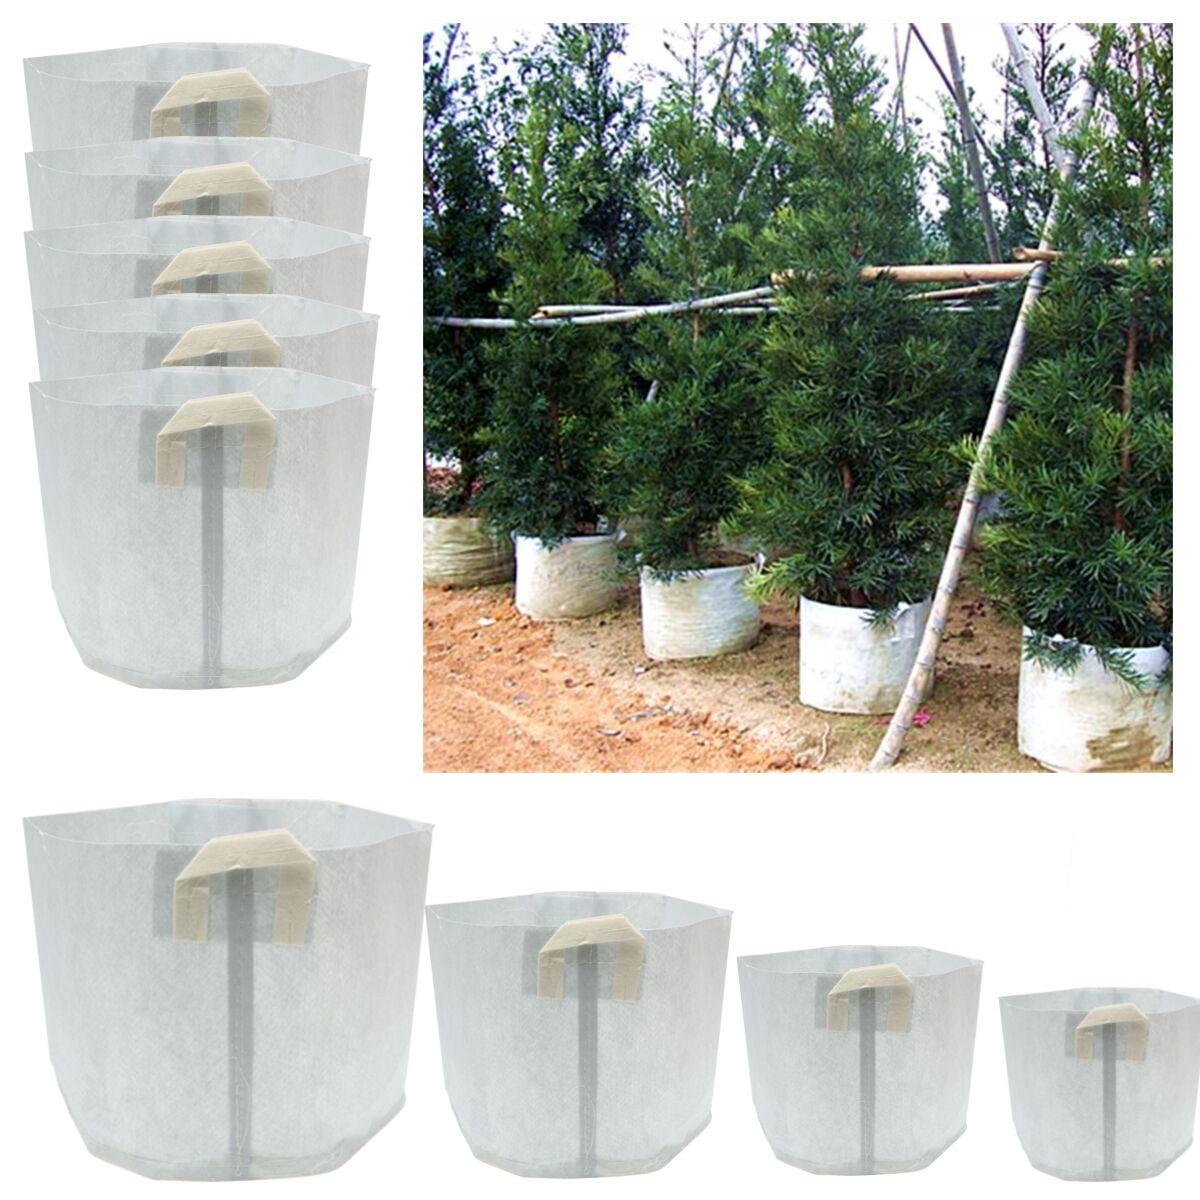 Meigar 5 Packs Fabric Grow Bags 15 50 80 Gallon Smart Pots Container Garden